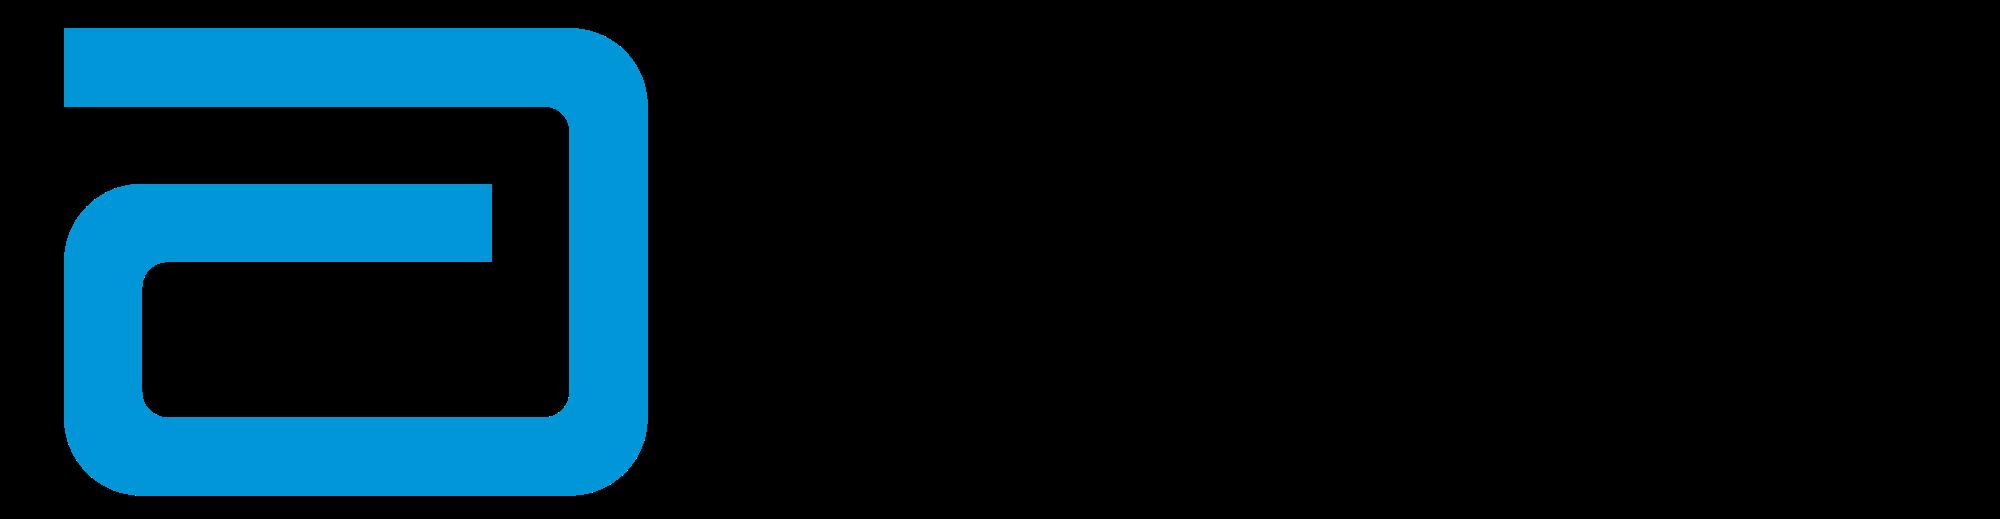 Abbot Laboratories Logo PNG - 97557